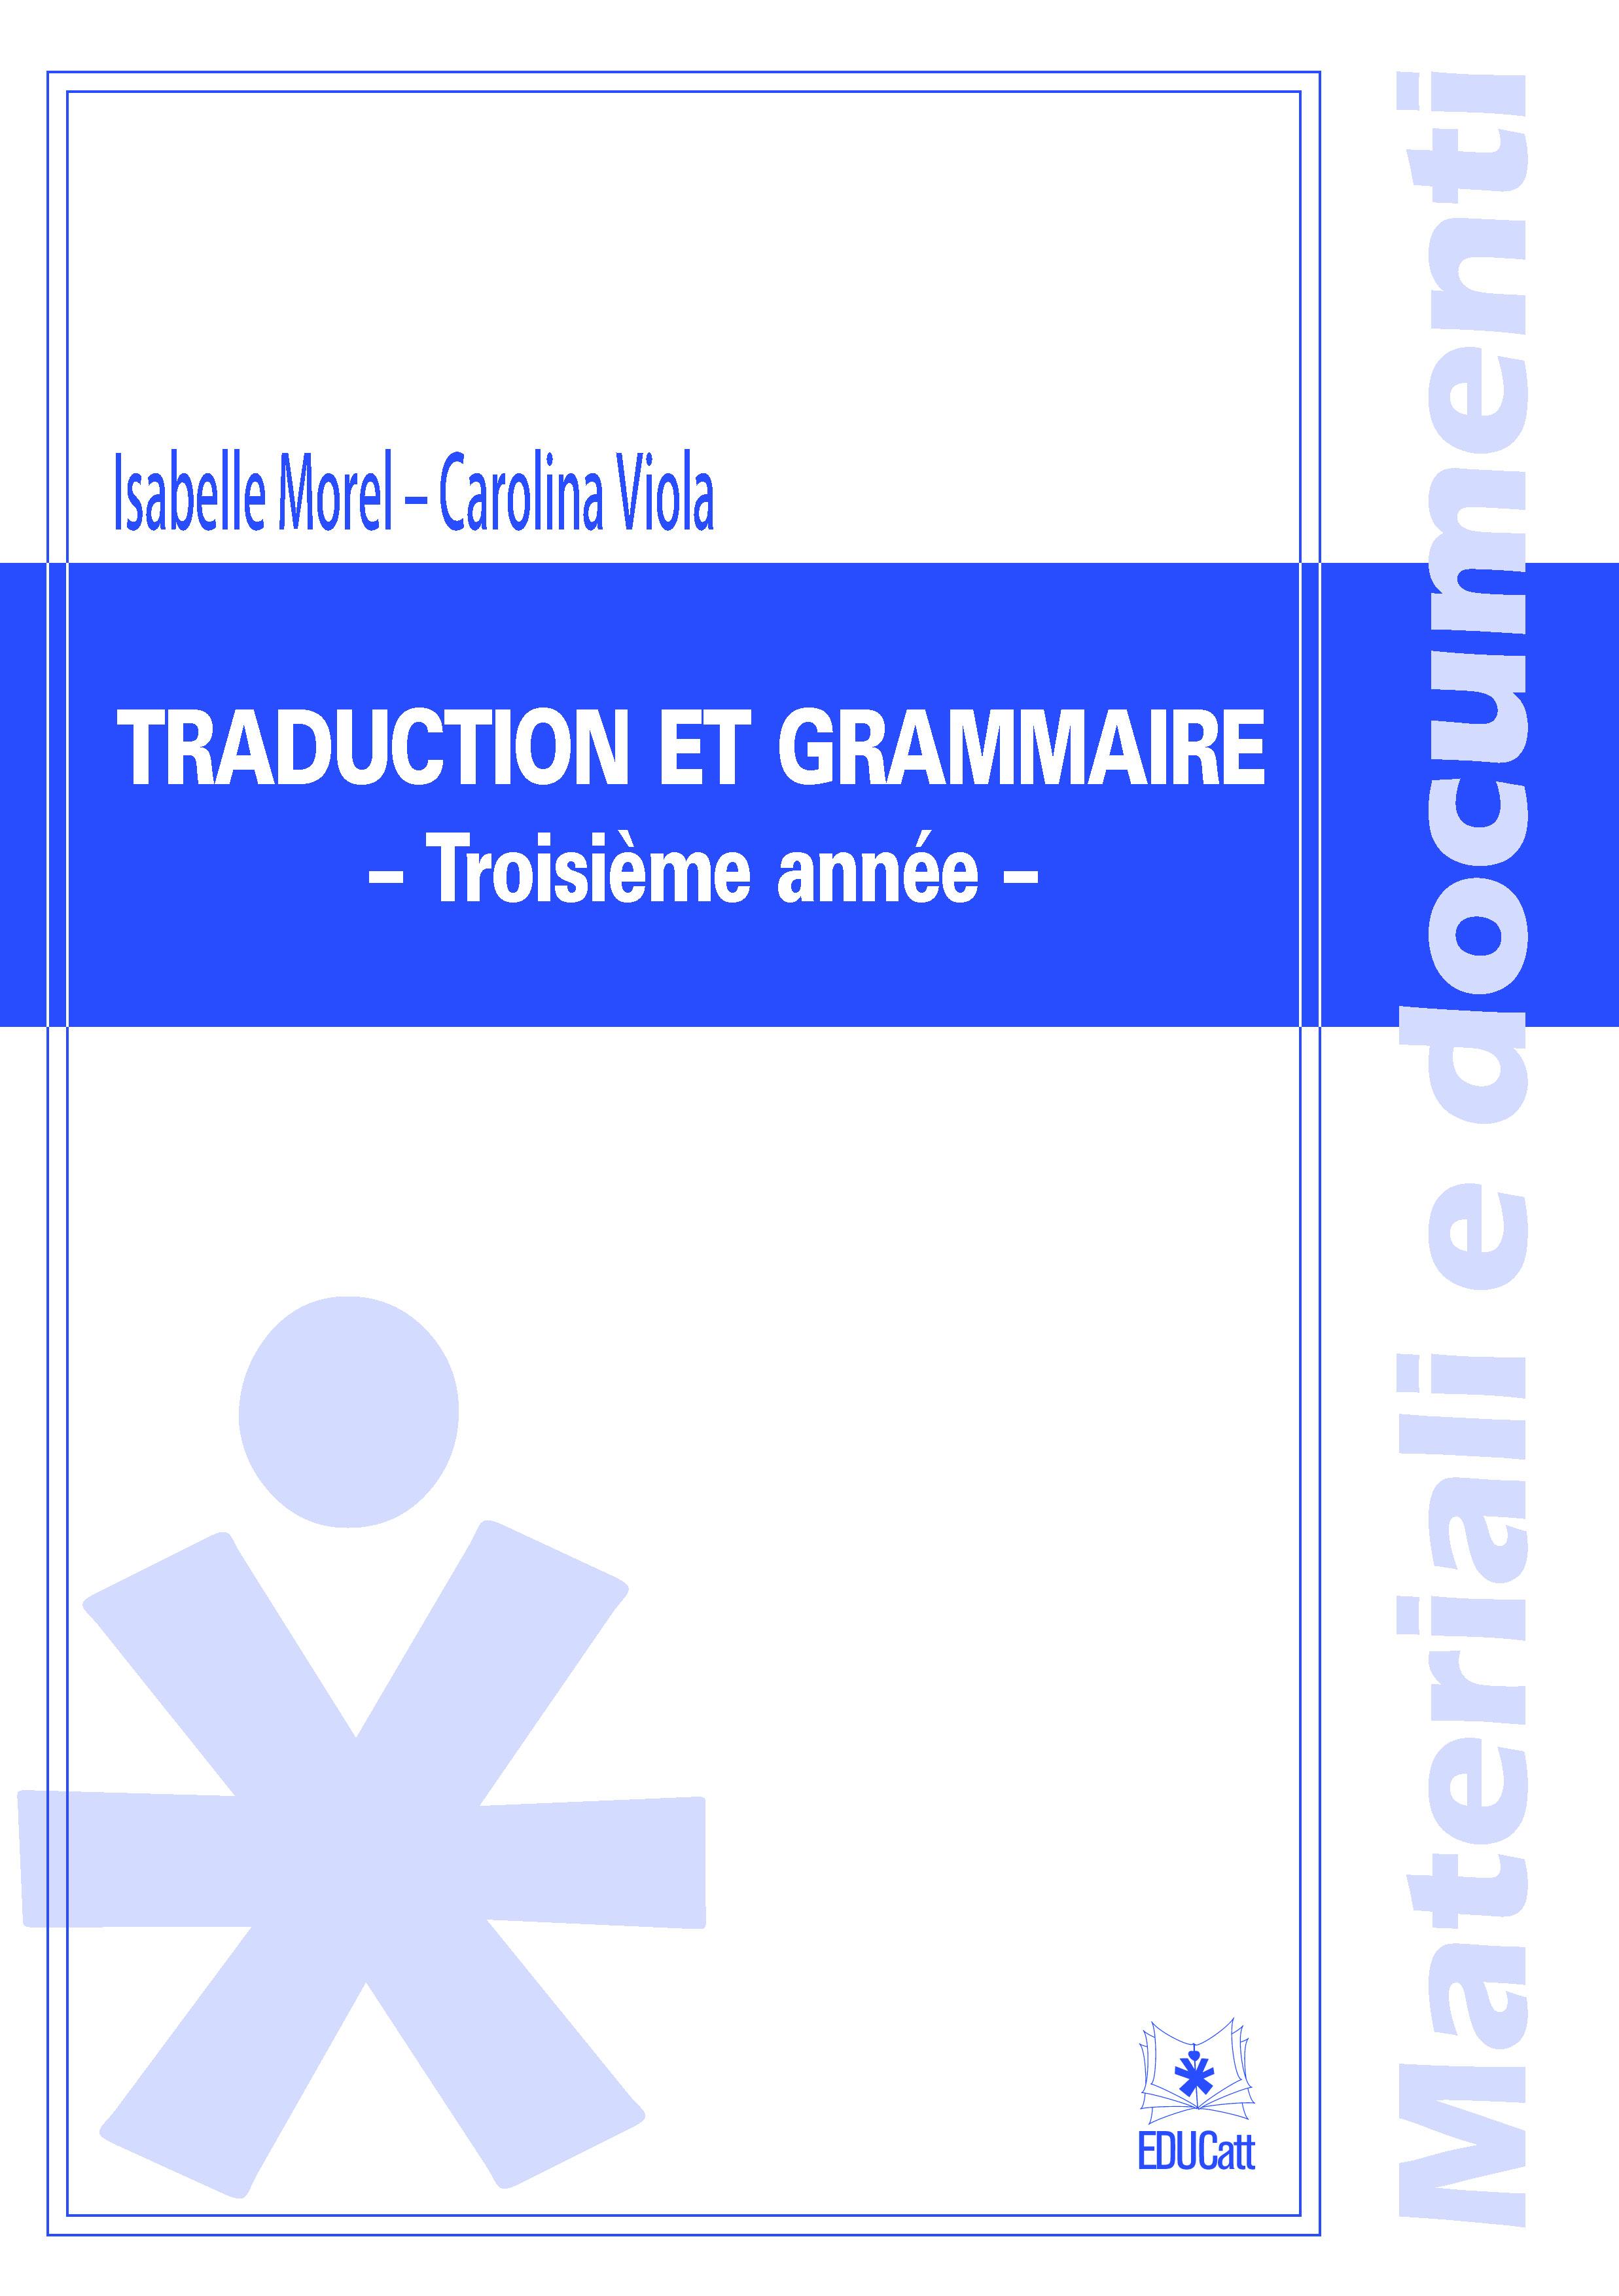 TRADUCTION ET GRAMMAIRE - TROISIEME ANNEE